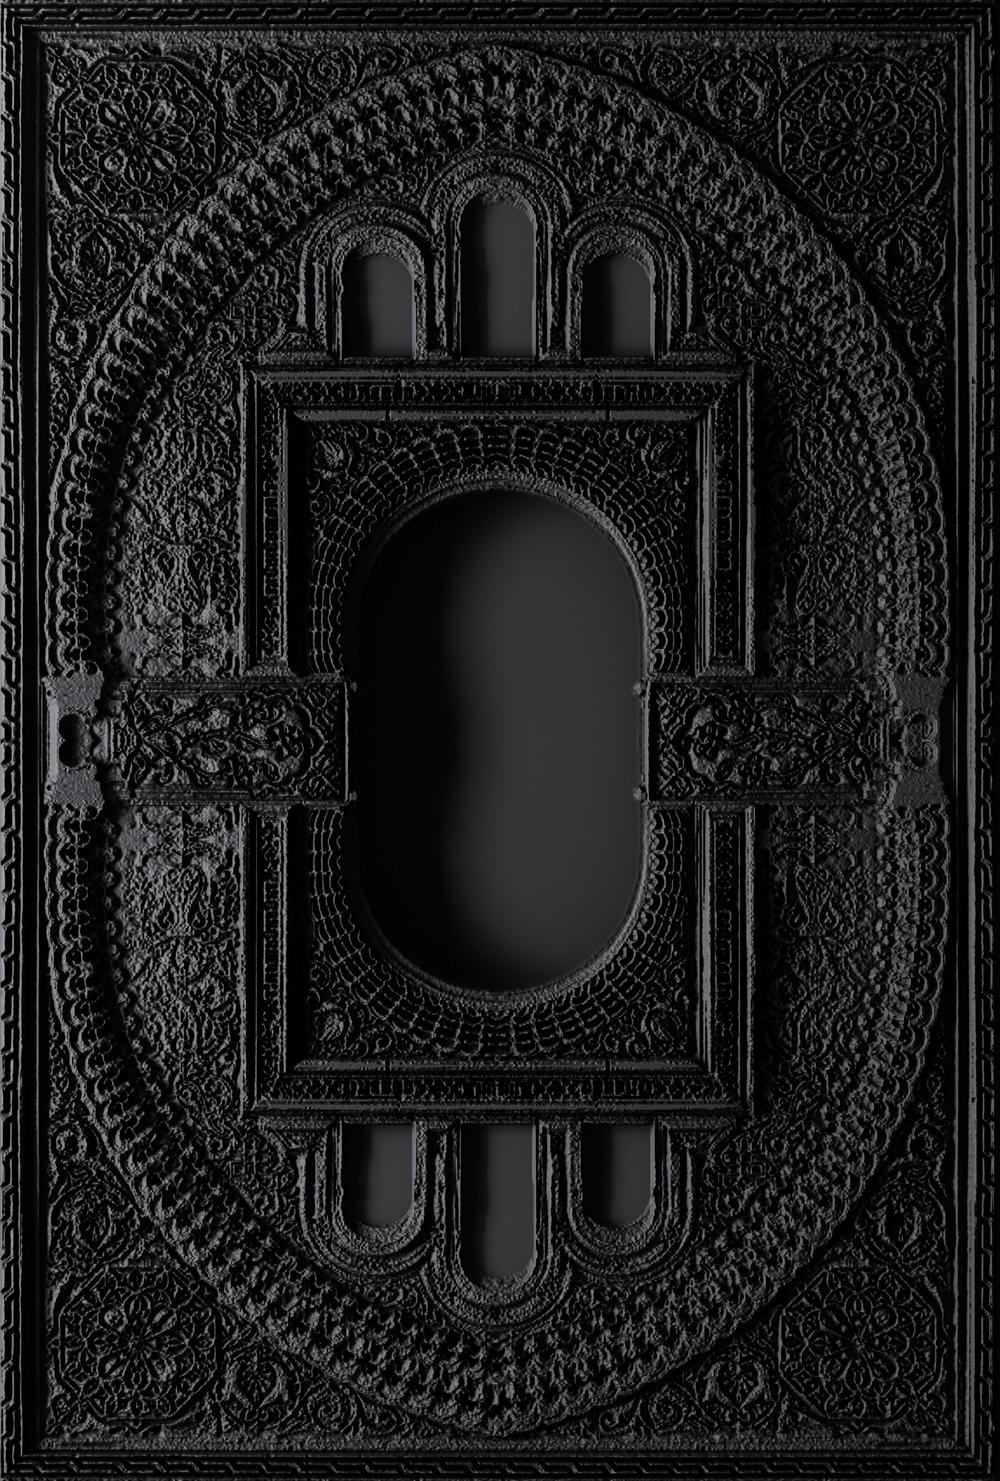 DF Heavens Gate by Marcel Wanders for Moooi Carpets 300dpi-300dpi-moooi-carpets.jpg